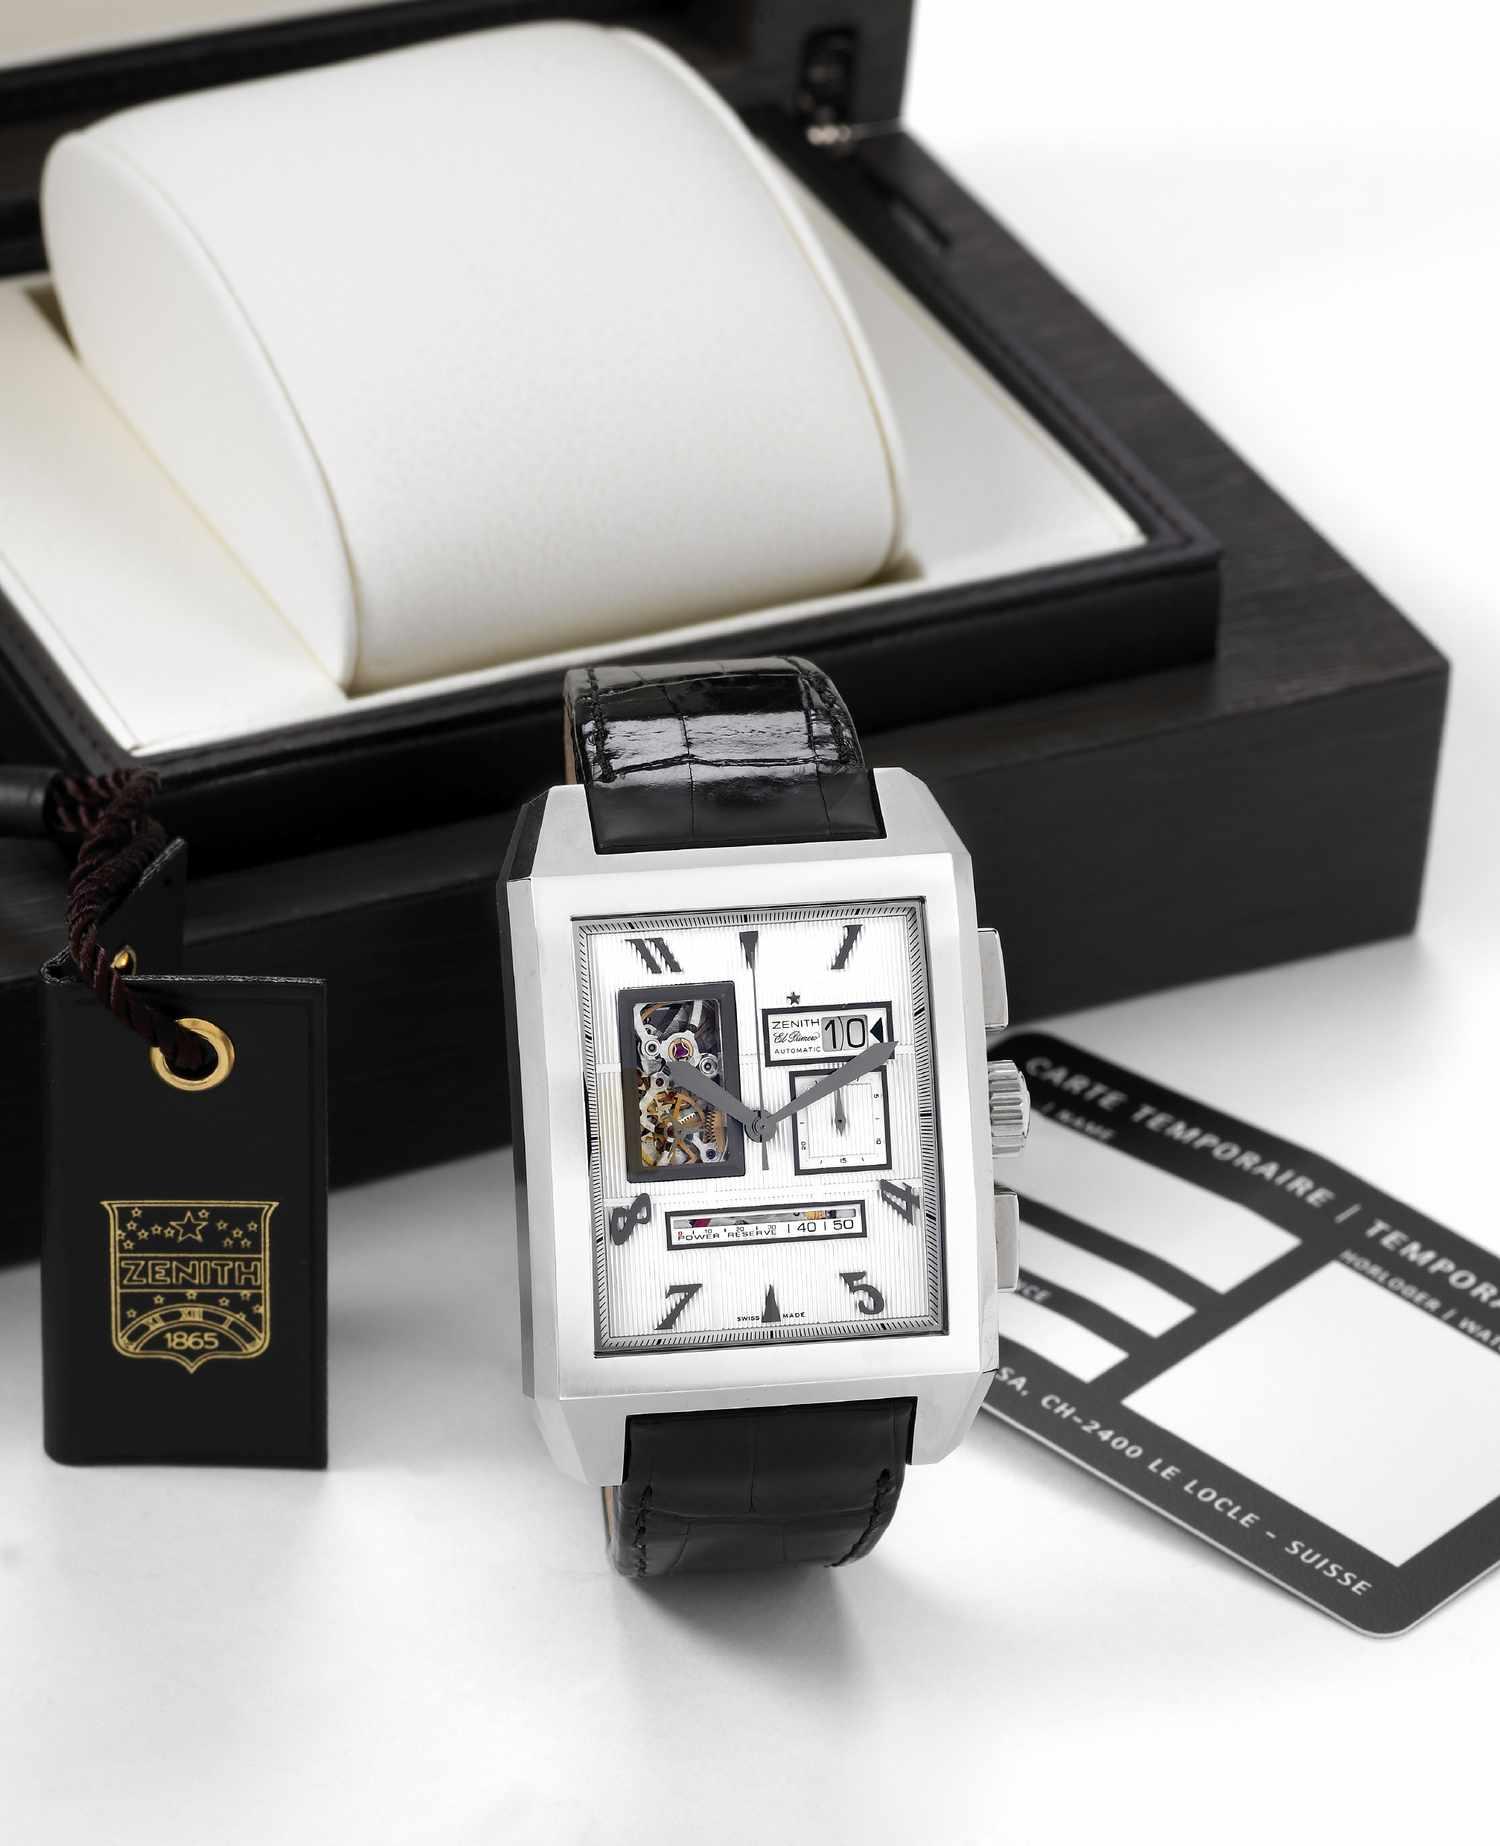 Клипарт - Настоящие Швейцарские часы. 50 HQ jpegs